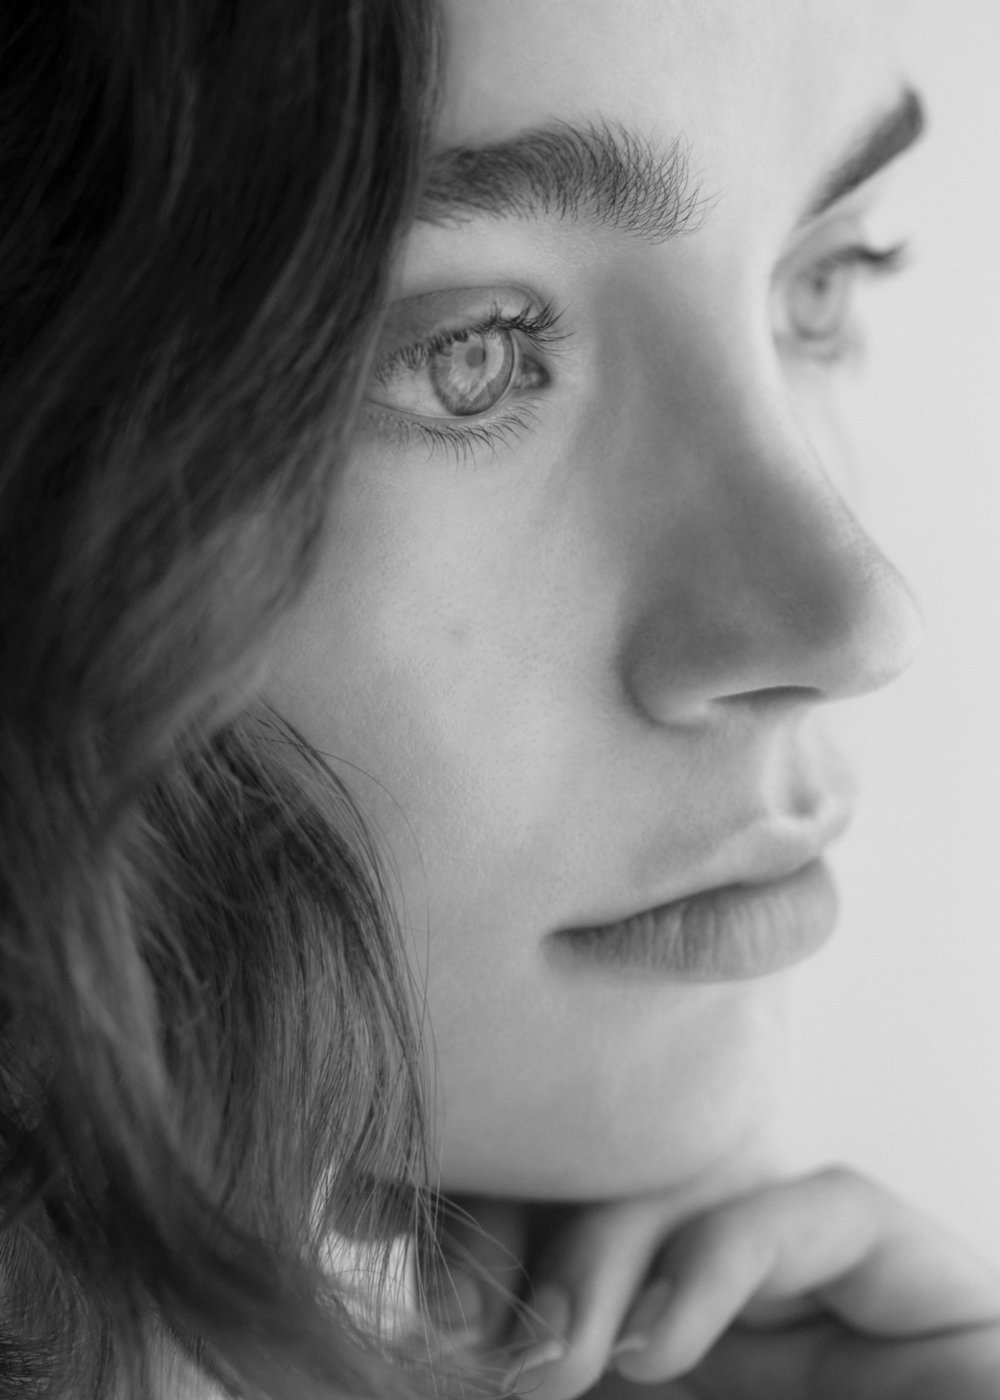 MODEL: LUIZA SCANDELARI   AGENCY: FORD